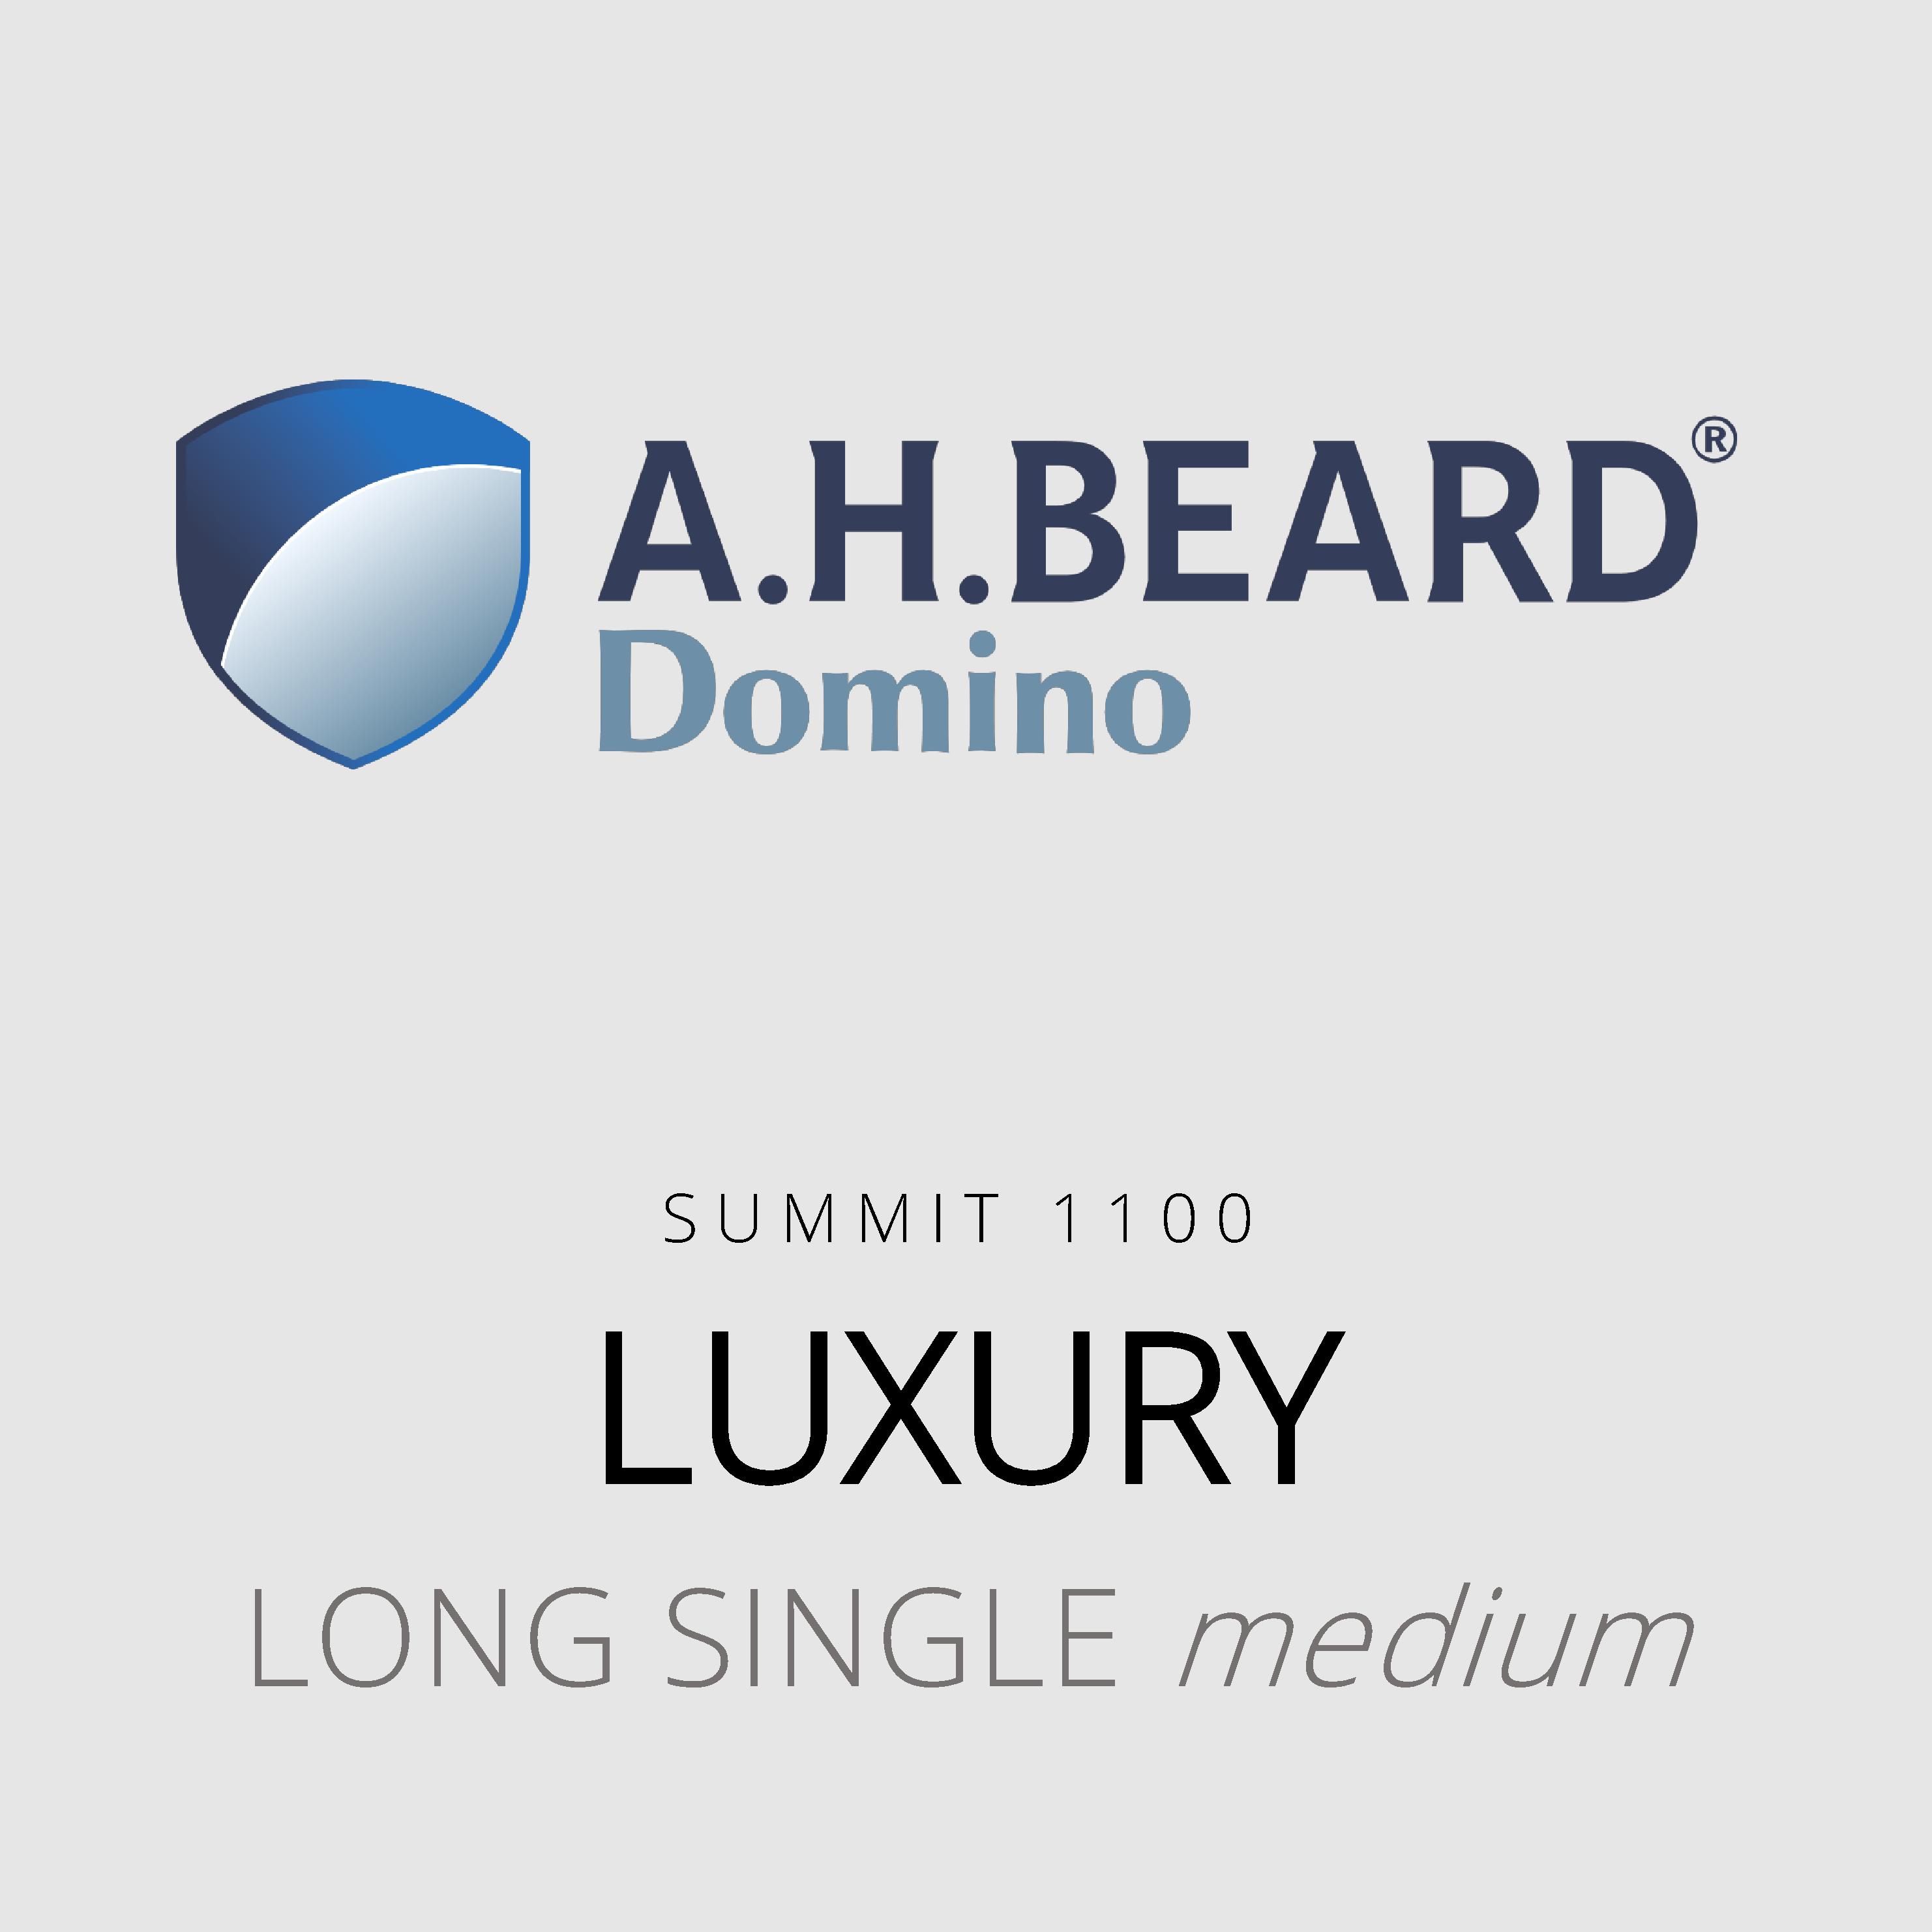 AH Beard Domino – Luxury – Summit 1100 – Long Single Medium Mattress